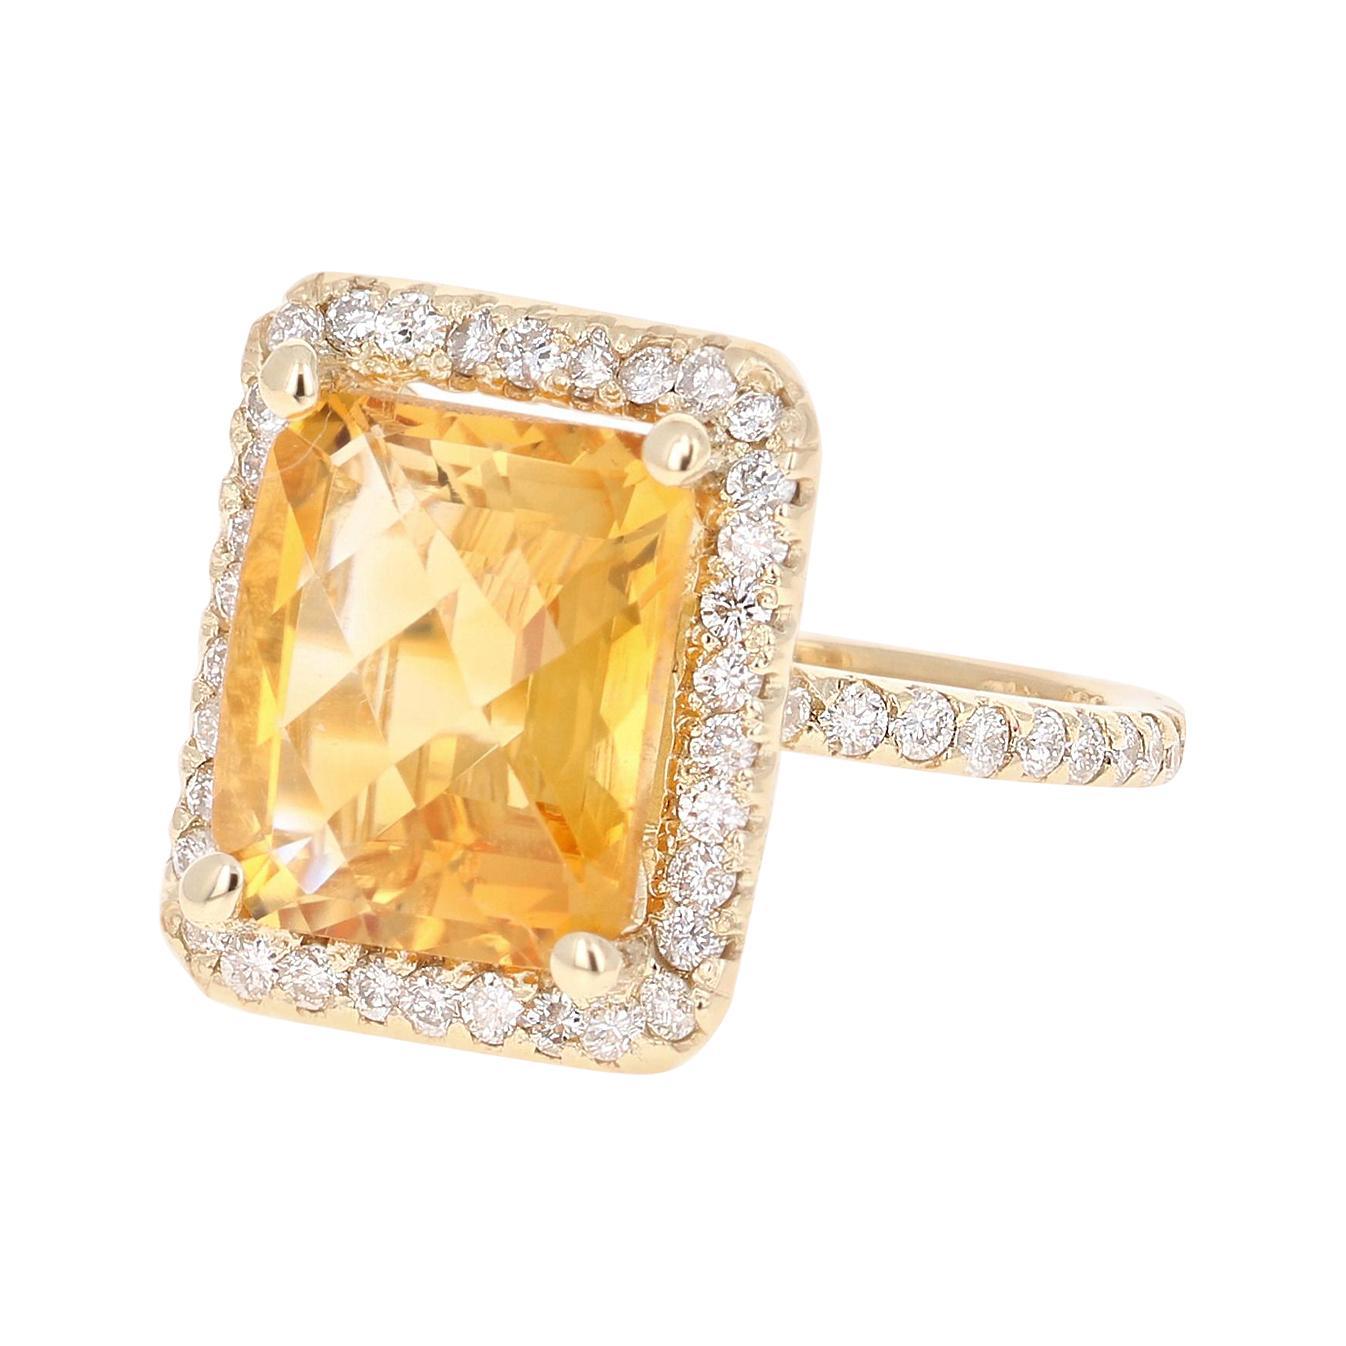 6.05 Carat Emerald Cut Citrine Diamond 14 Karat Yellow Gold Engagement Ring